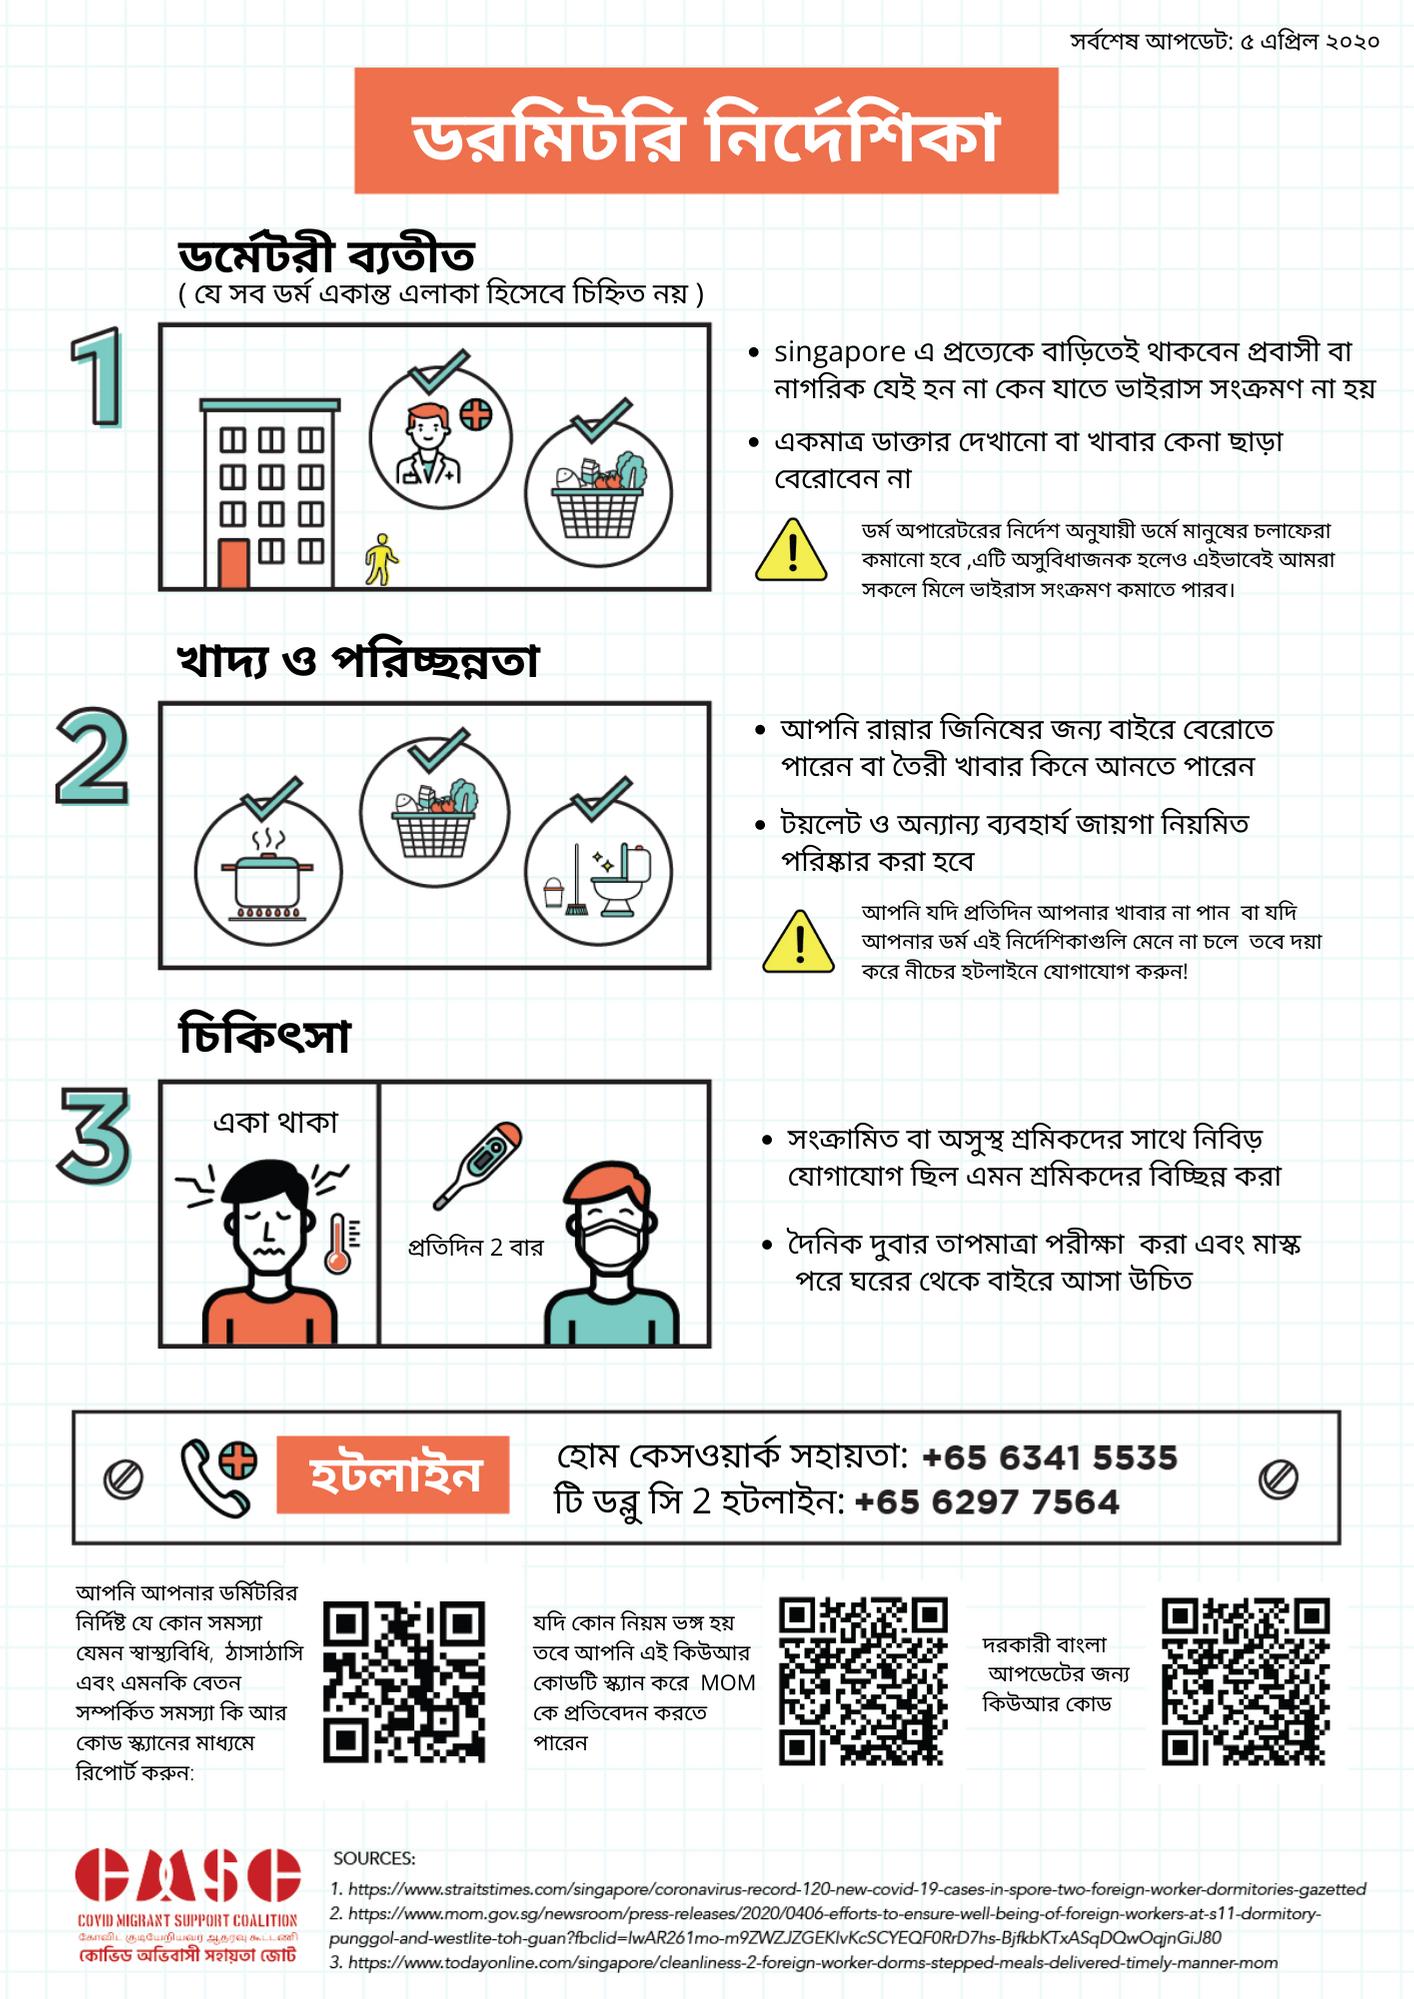 Covid Migrant Poster 2 Bengali